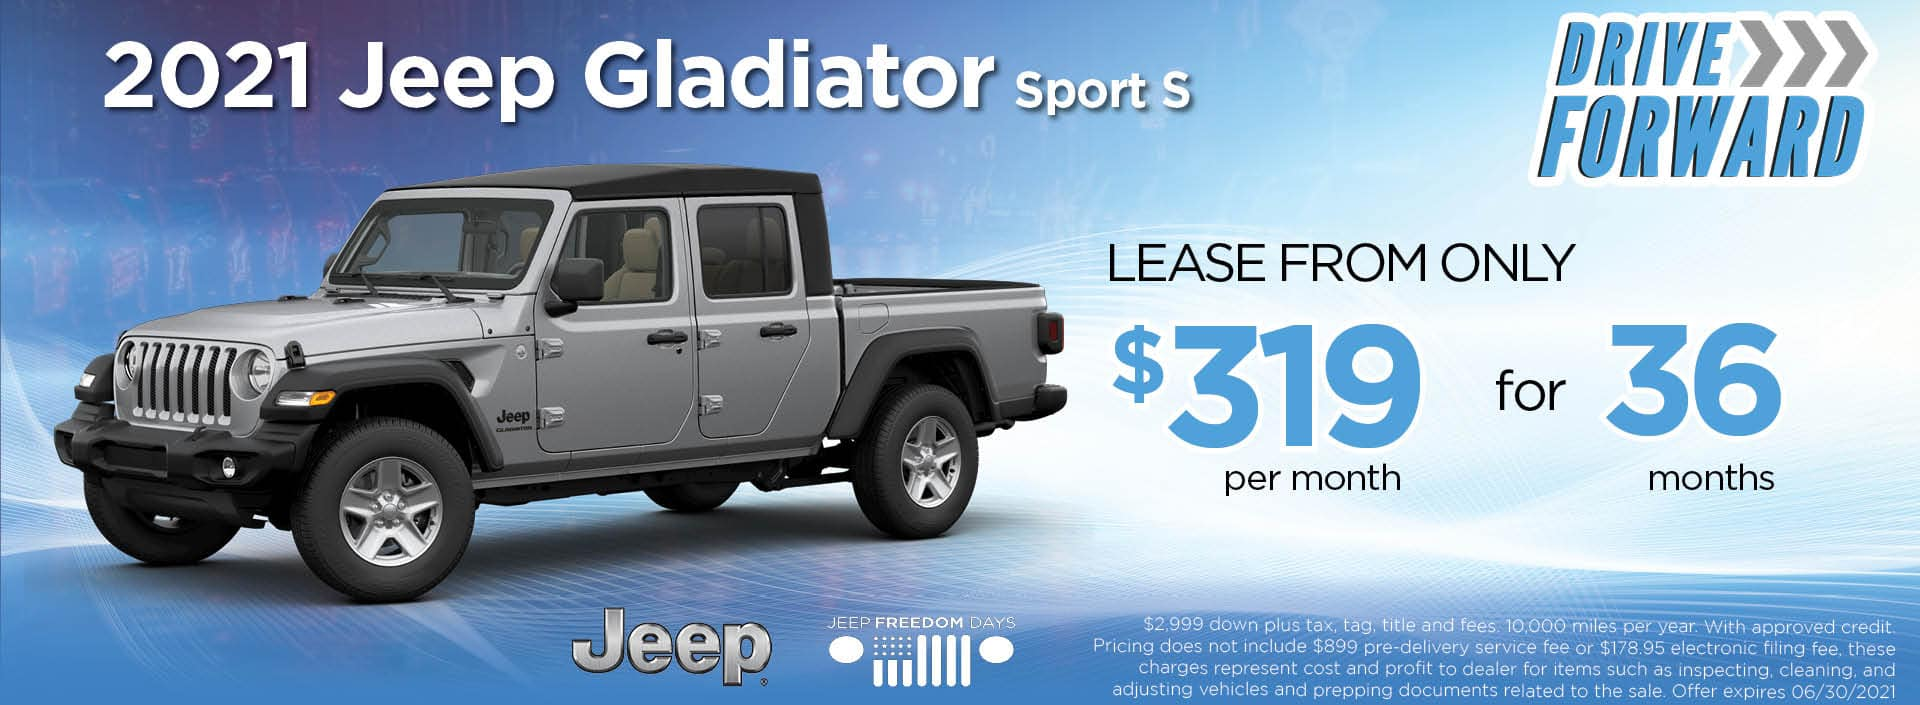 21 Gladiator 319